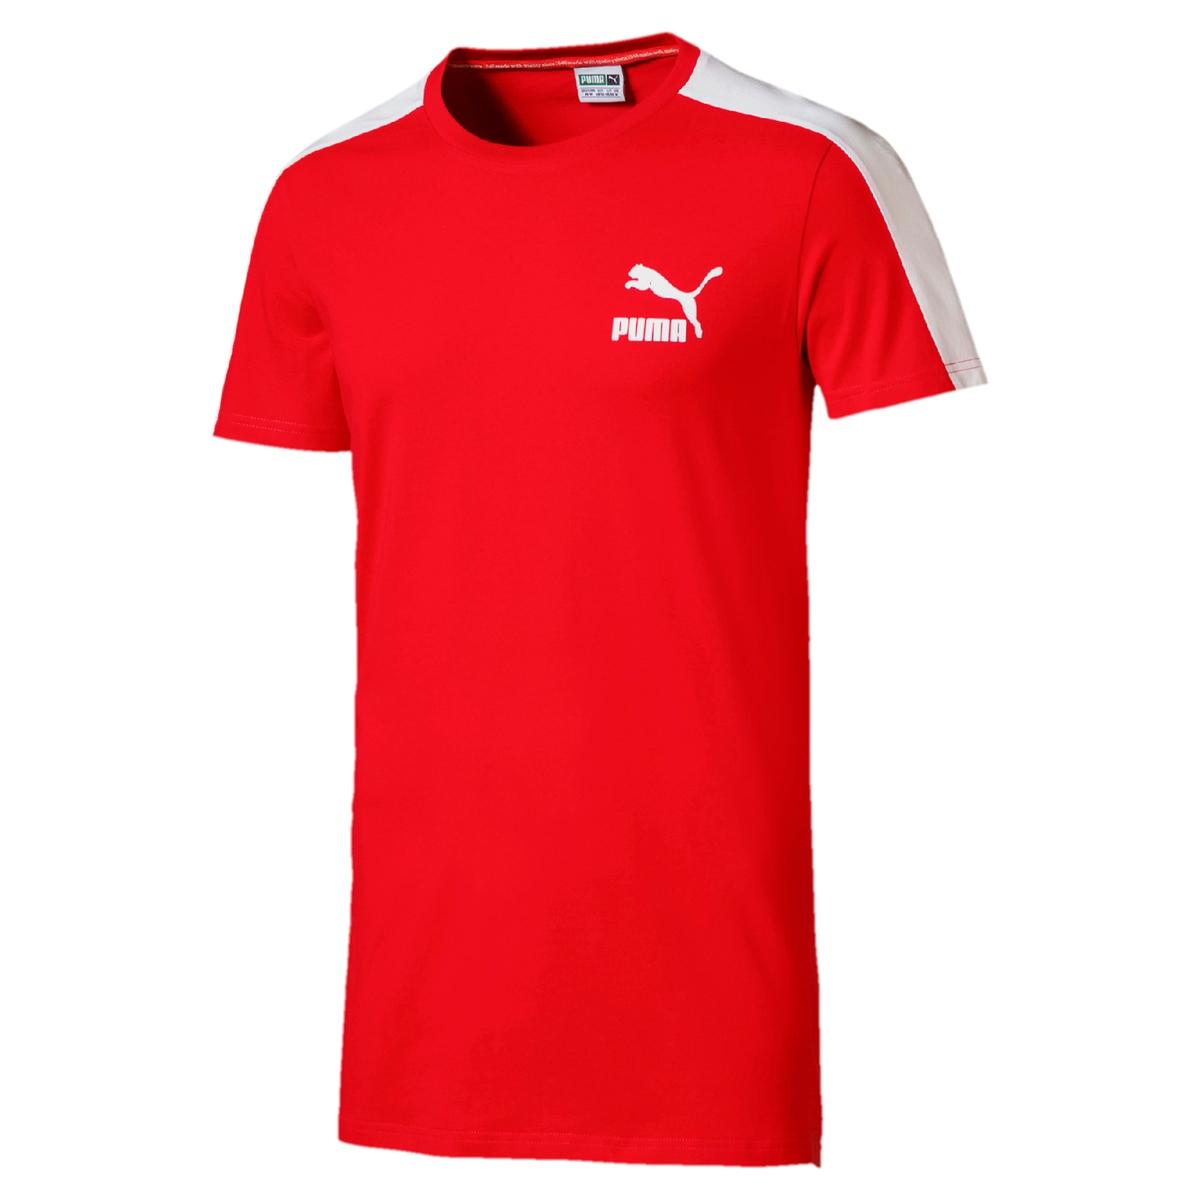 T-shirt lisa com gola redonda, mangas curtas